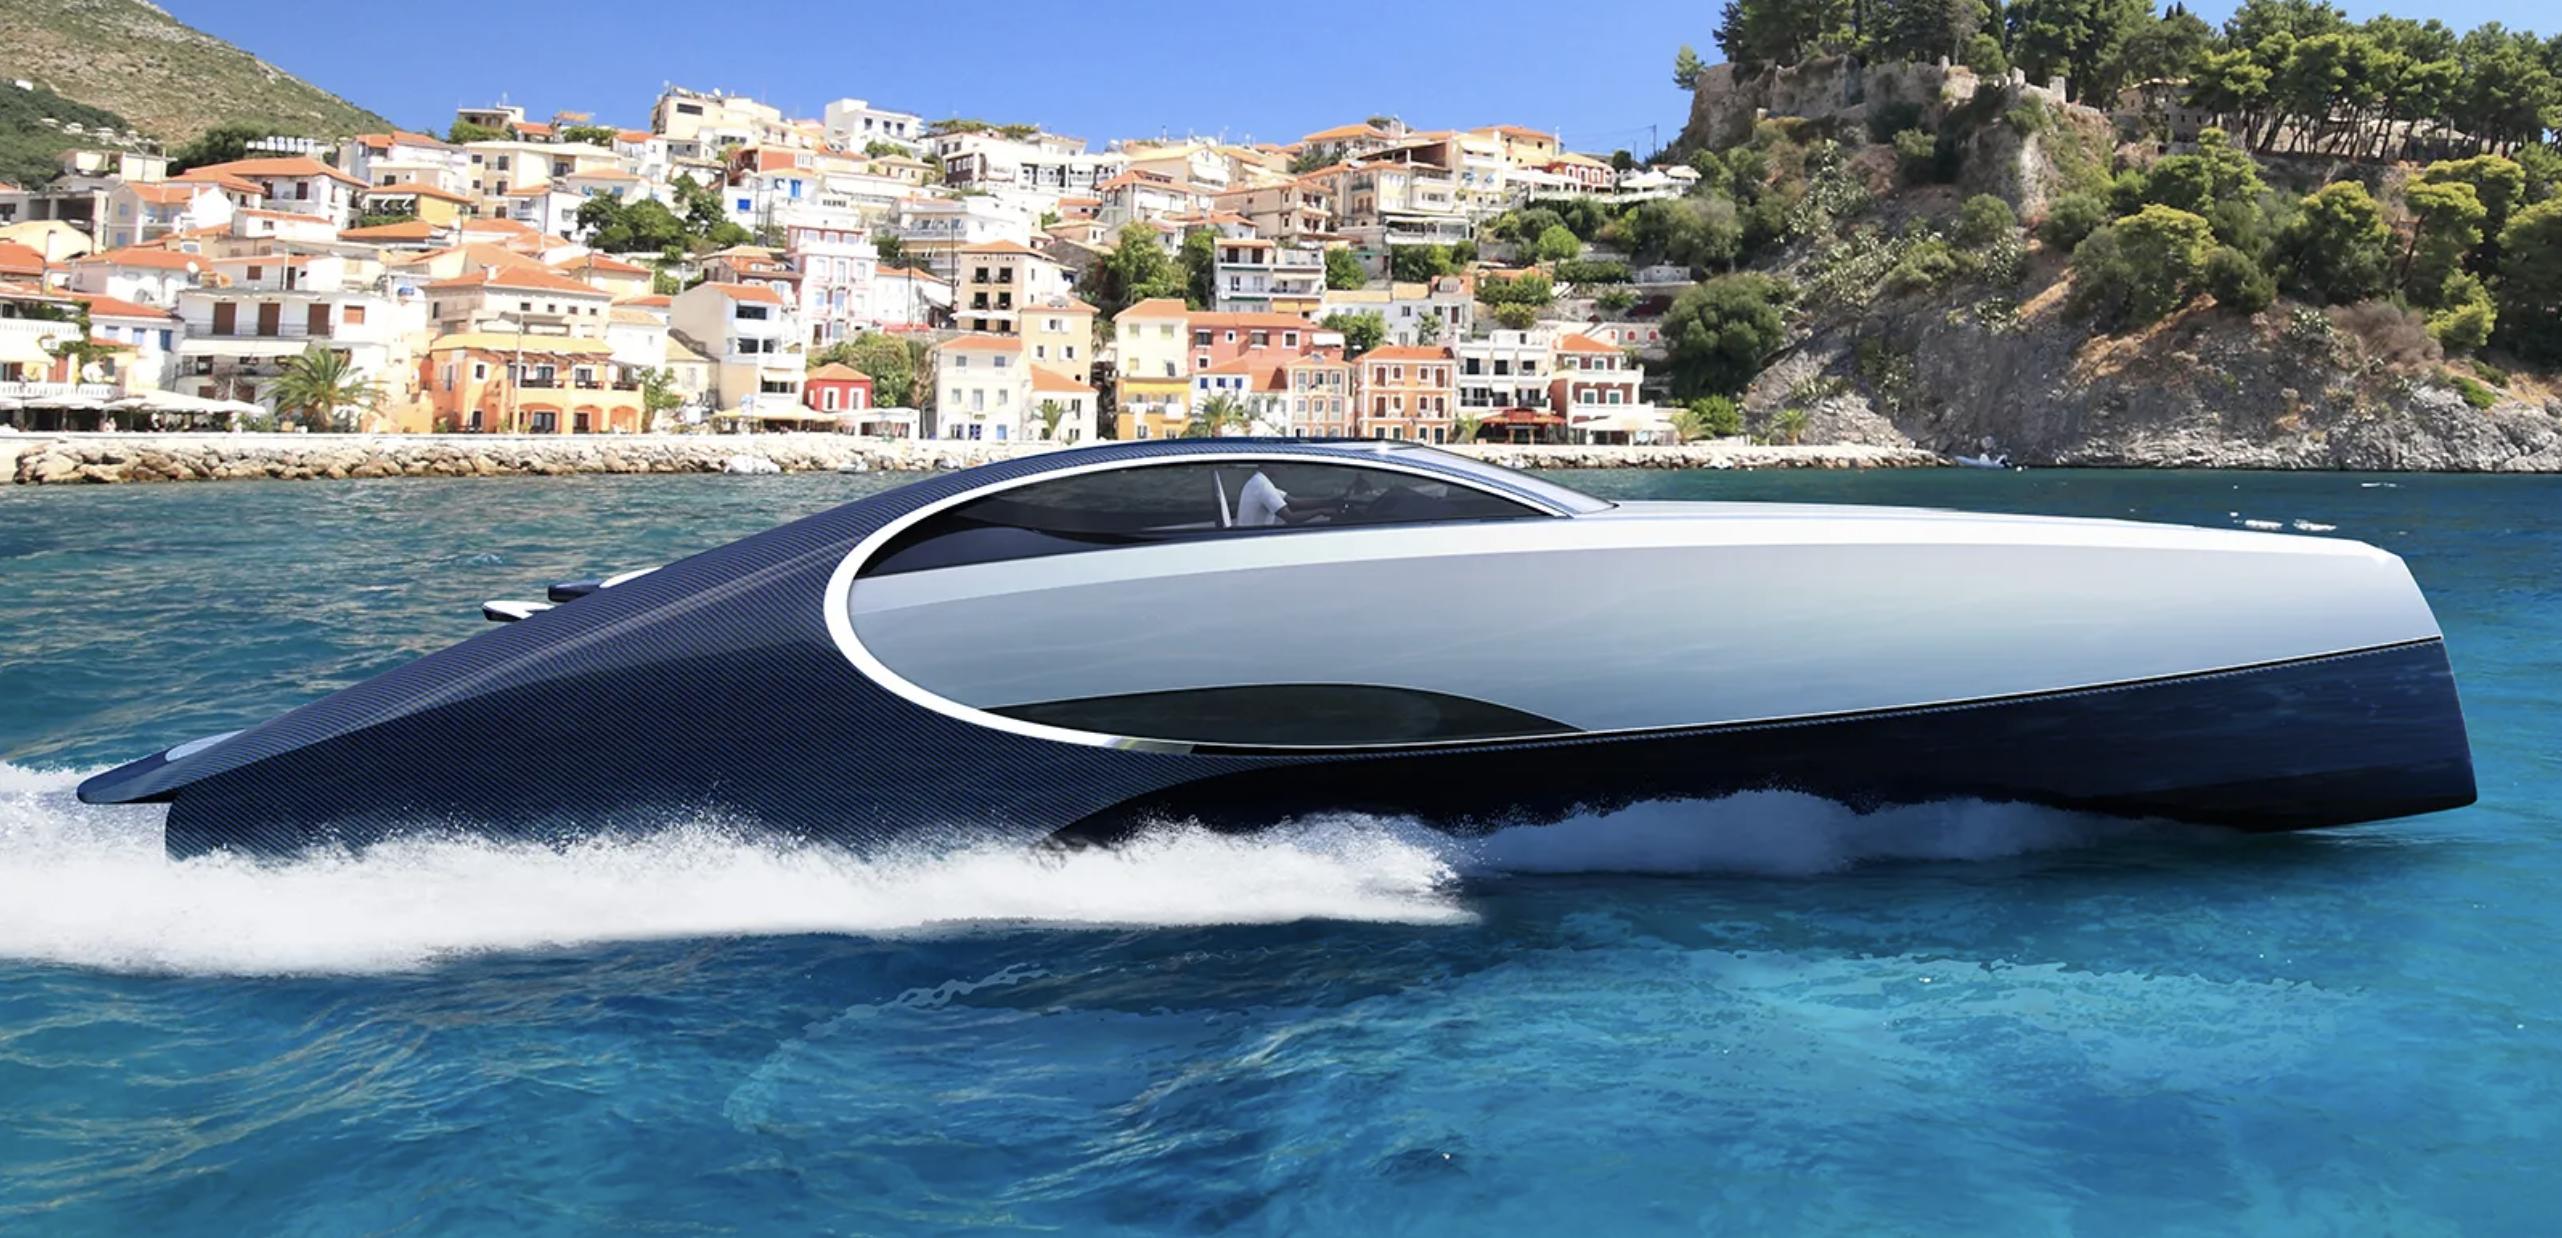 Niniette 66-Bugatti-speed-boat-palmer-johnson-Moncada-Yachts